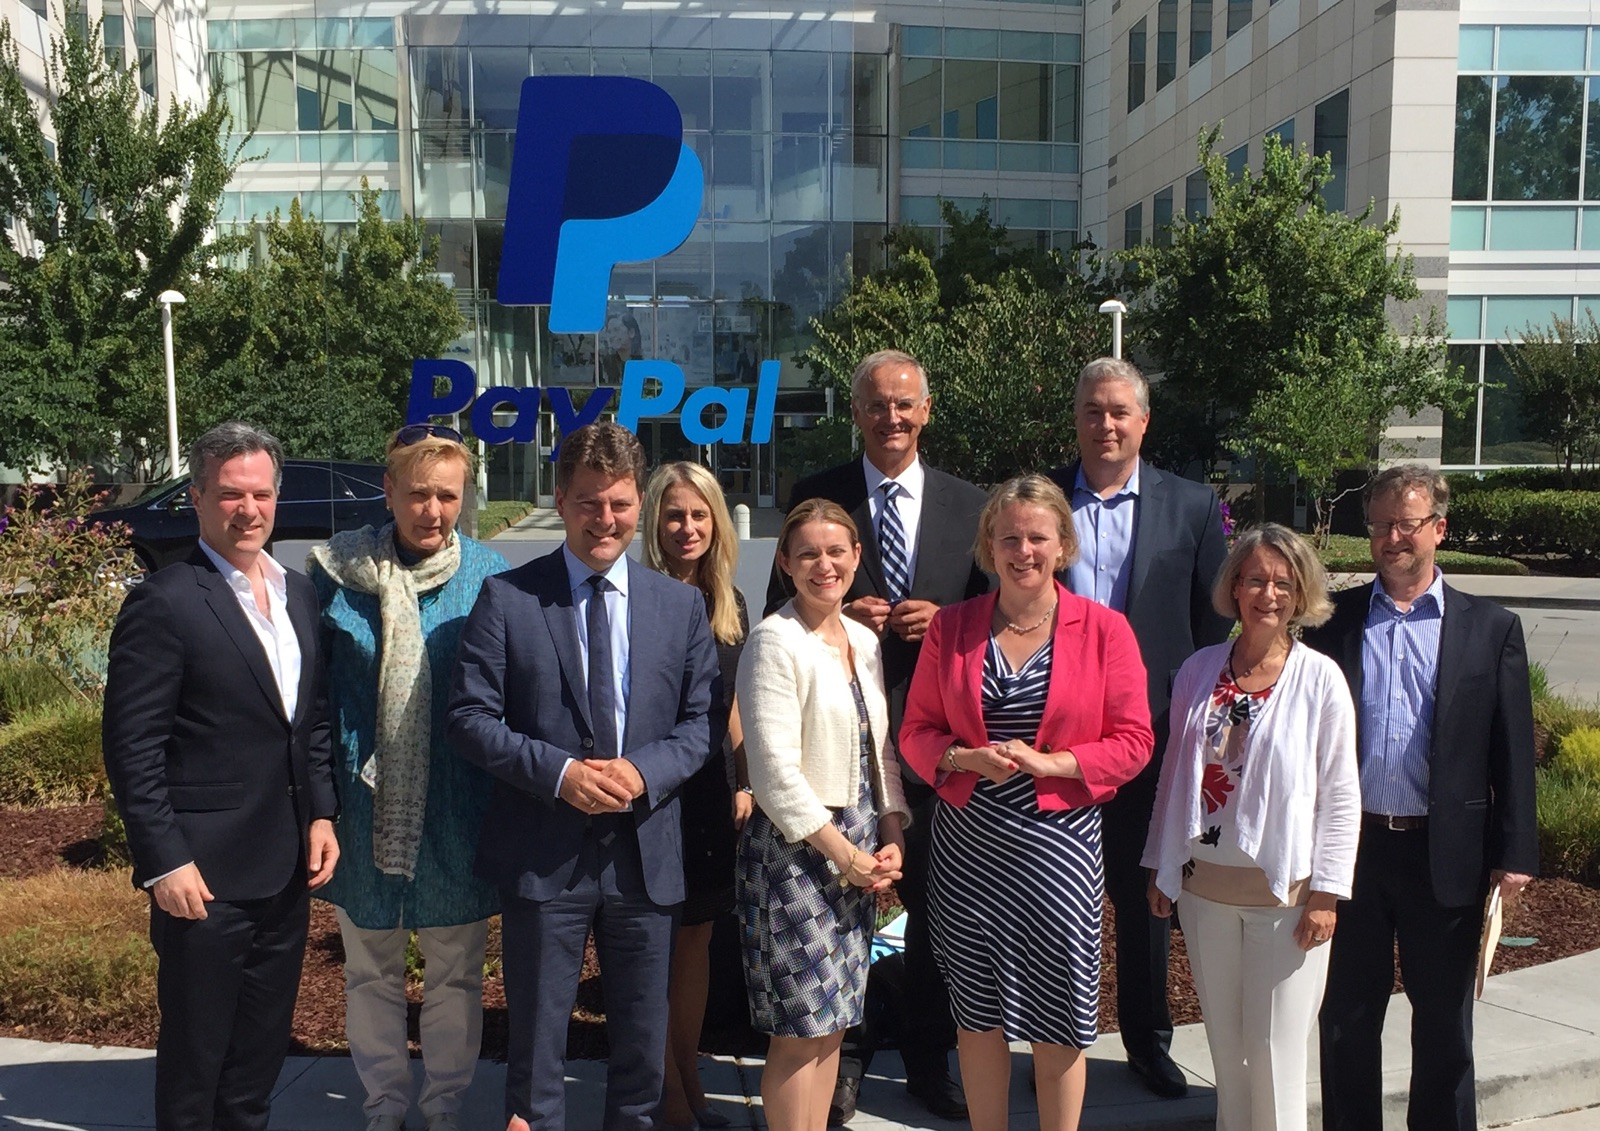 PayPal had the pleasure to welcome MEPs Vicky Ford (UK, IMCO Chair), Catherine Stihler (UK, IMCO Vice-Chair), Dita Charanzová (Czech Republic), Evelyne Gebhardt (Germany), Andreas Schwab (Germany), Róża Gräfin von Thun und Hohenstein (Poland) and Lambert van Nistelrooij (Netherlands).